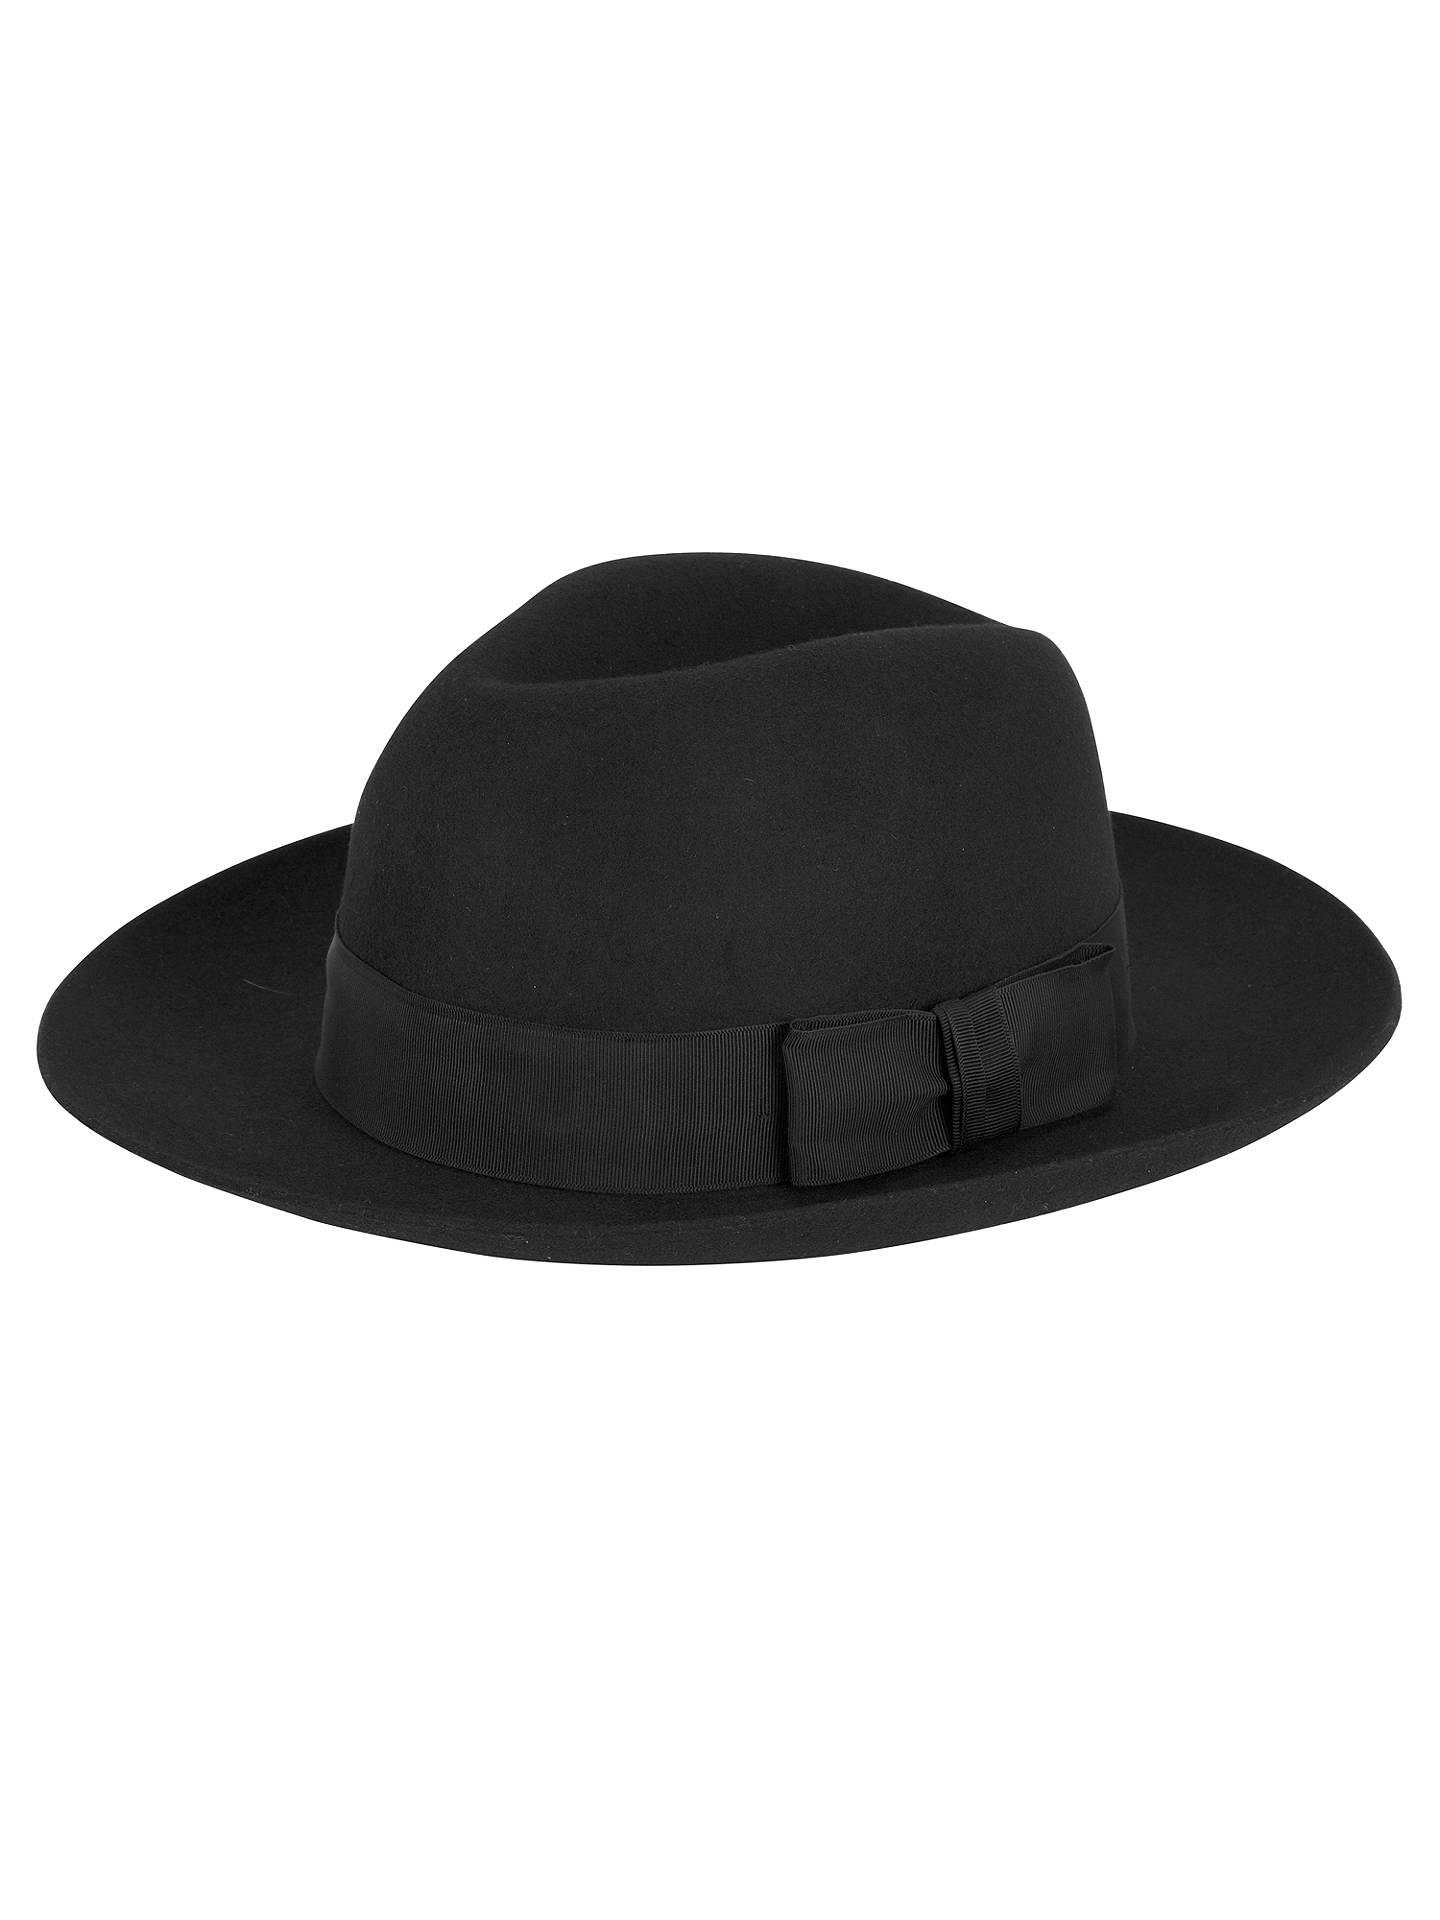 e41e30d56 Christys' Grosvenor Wide Brim Wool Fedora Hat at John Lewis & Partners